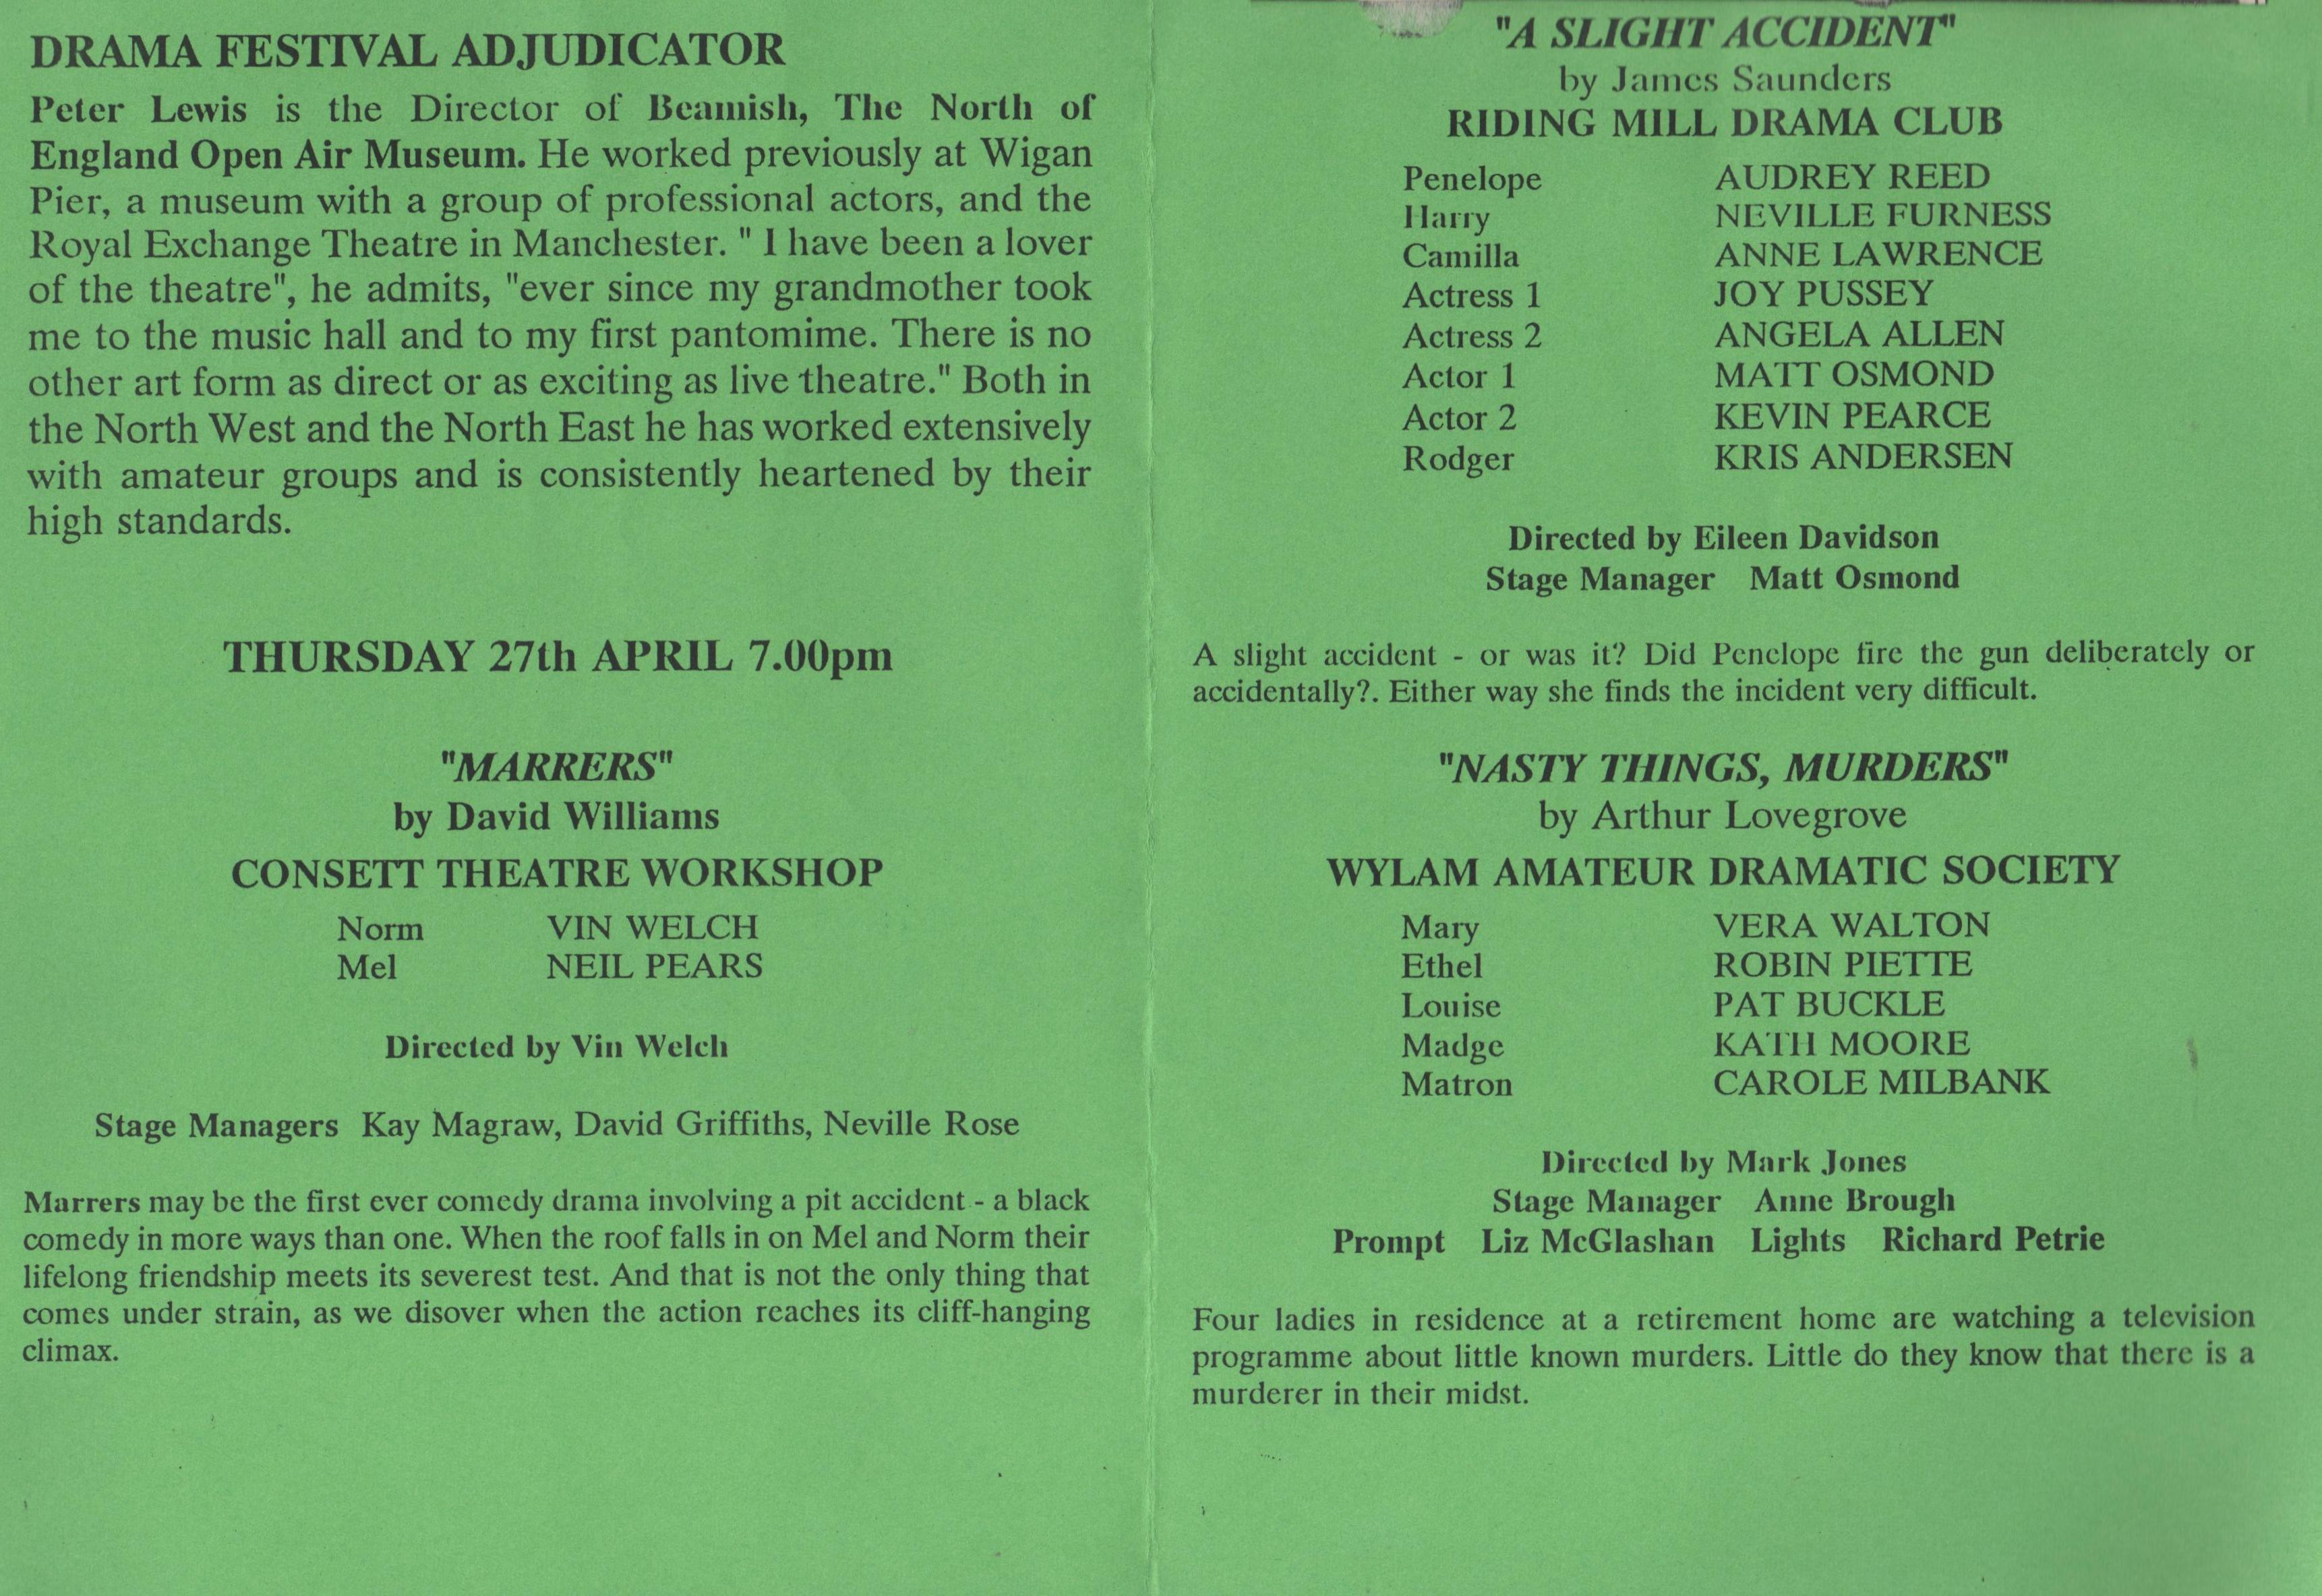 1995 Riding Mill Drama Club, Tynedale Fe